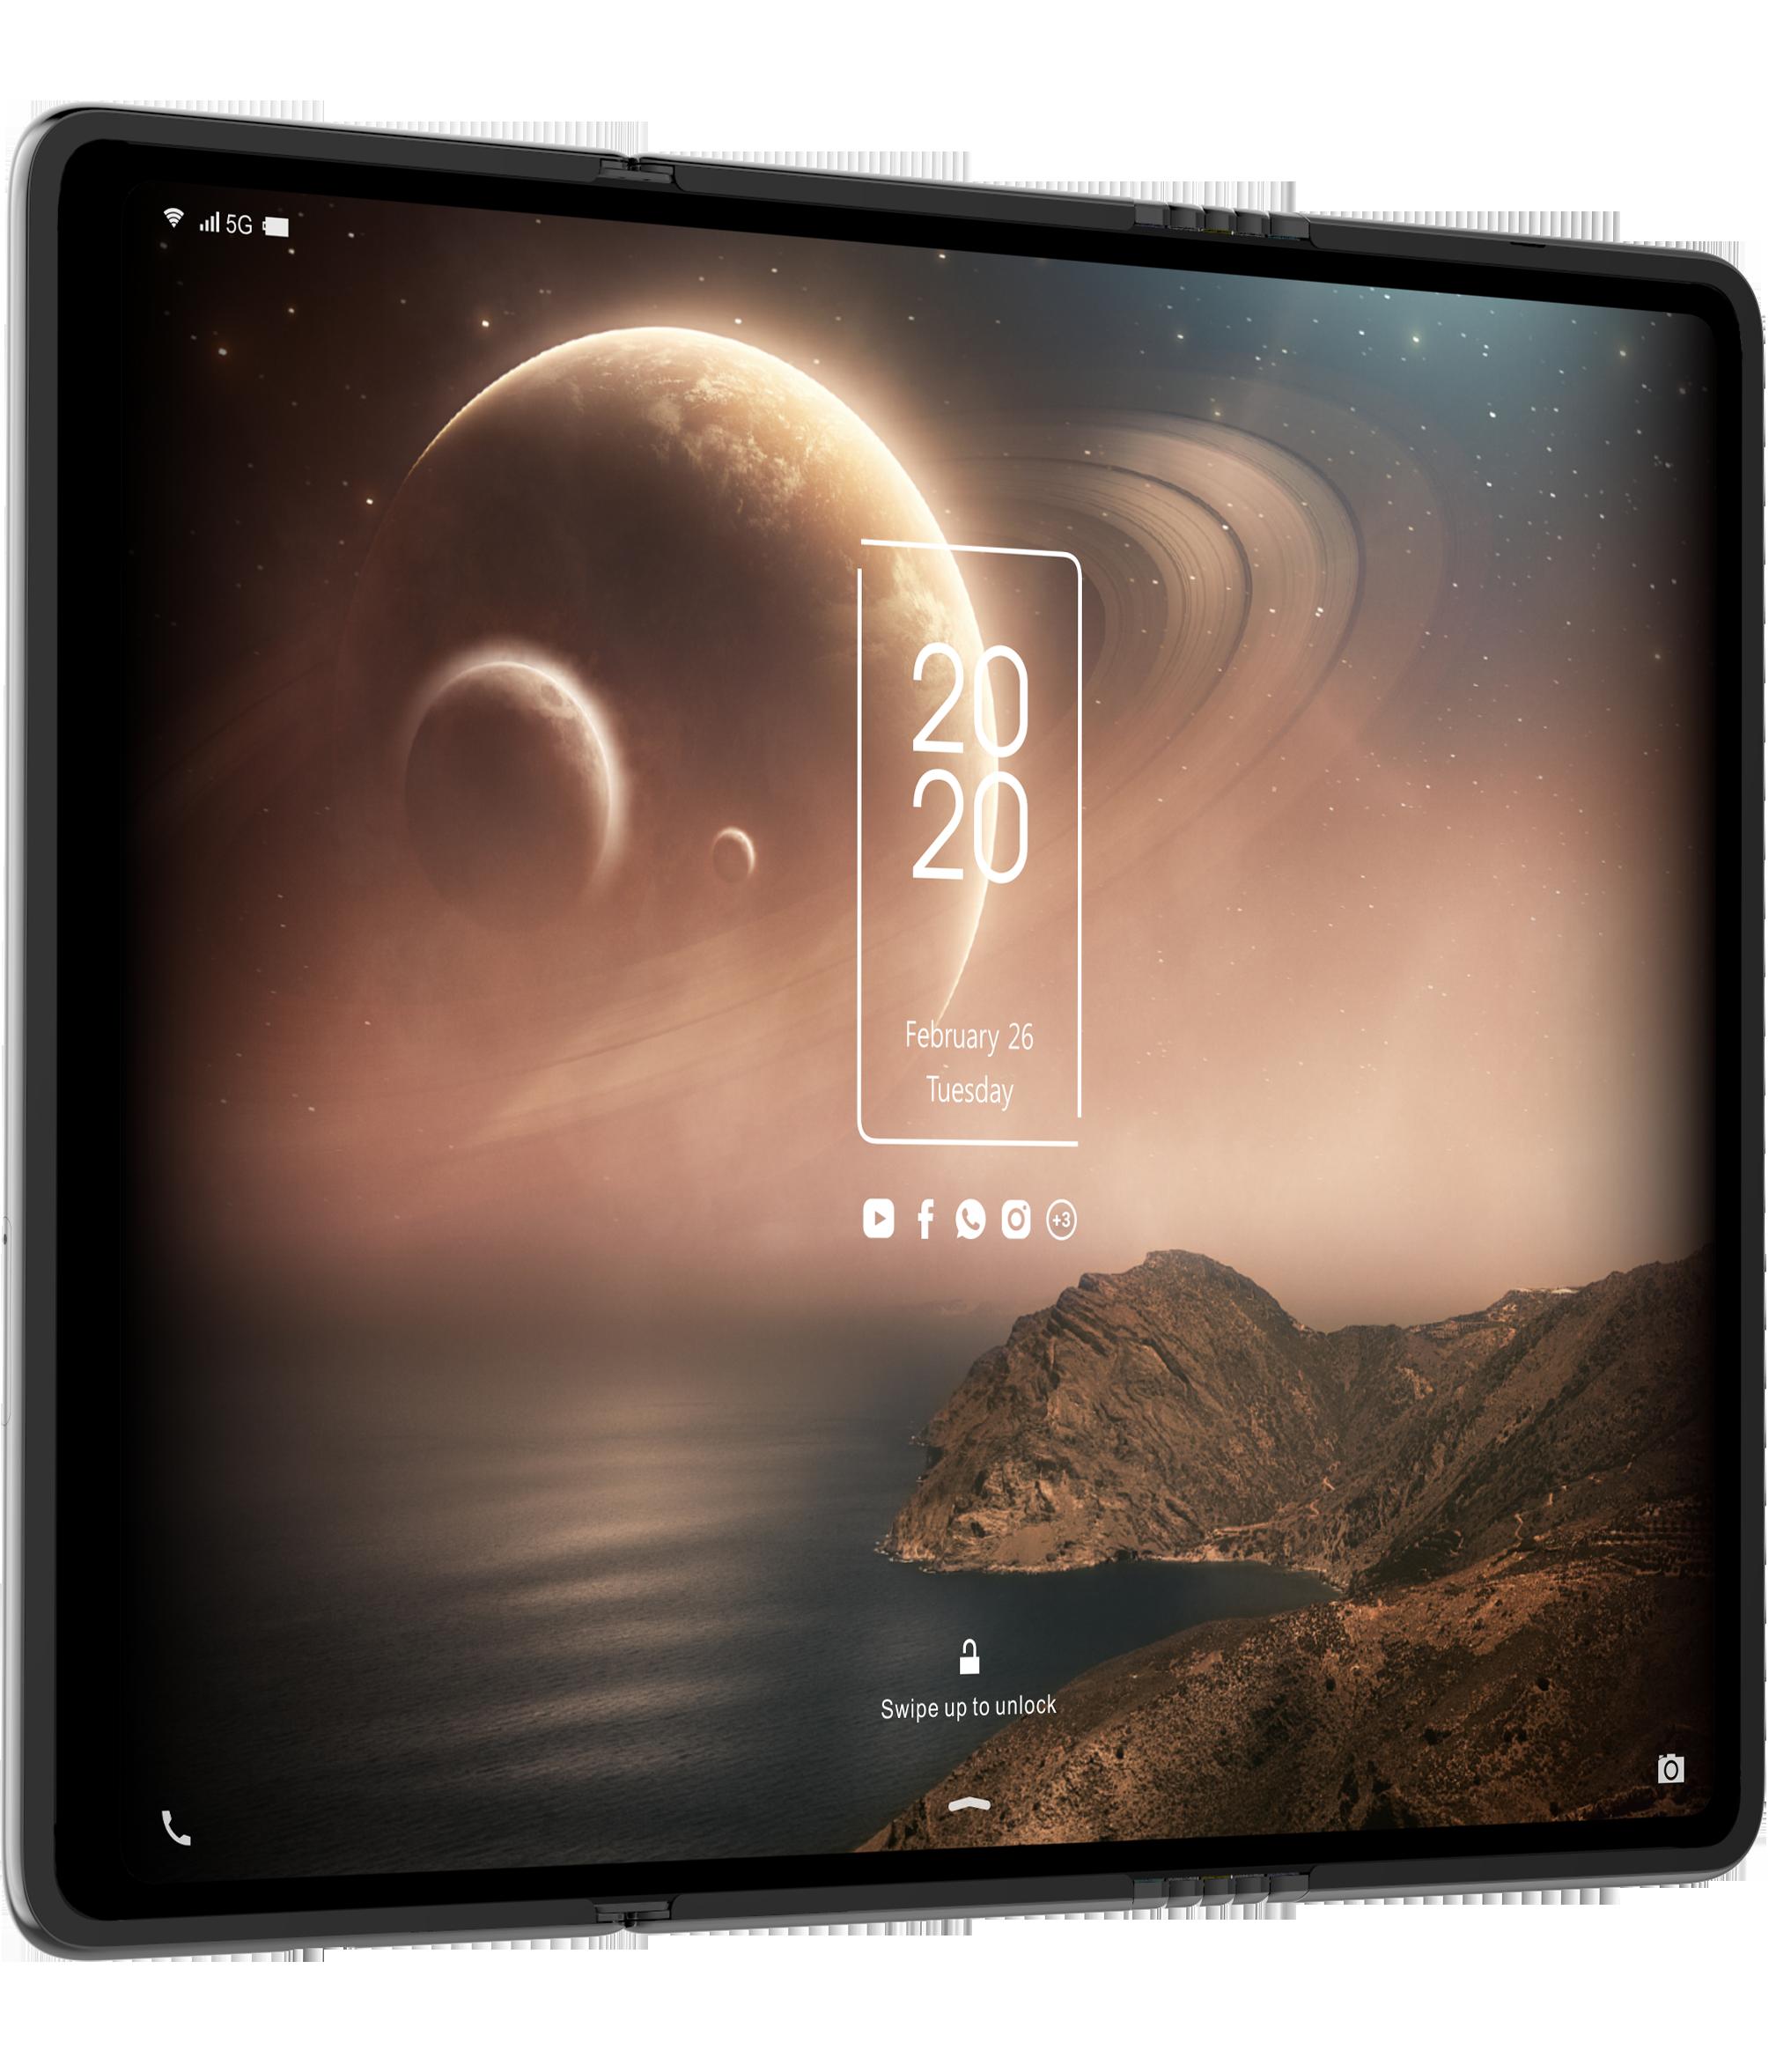 Tri-fold display concept-image 4